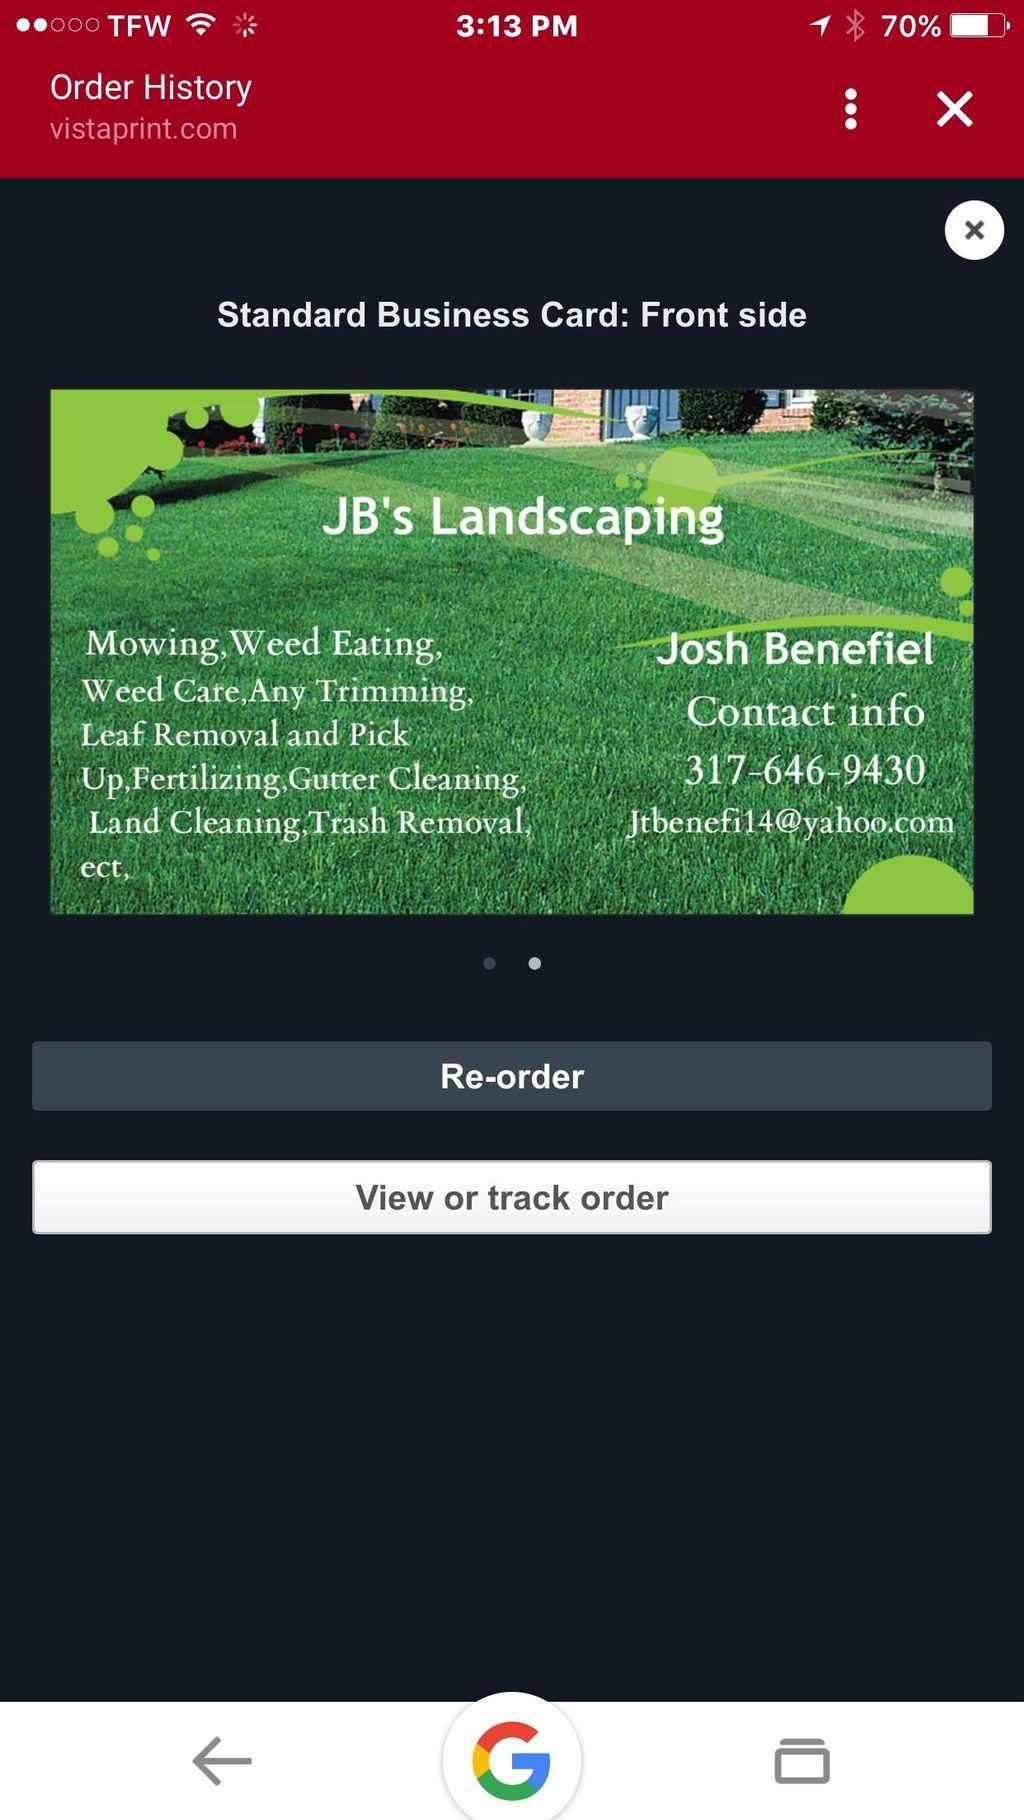 JB's LandScaping